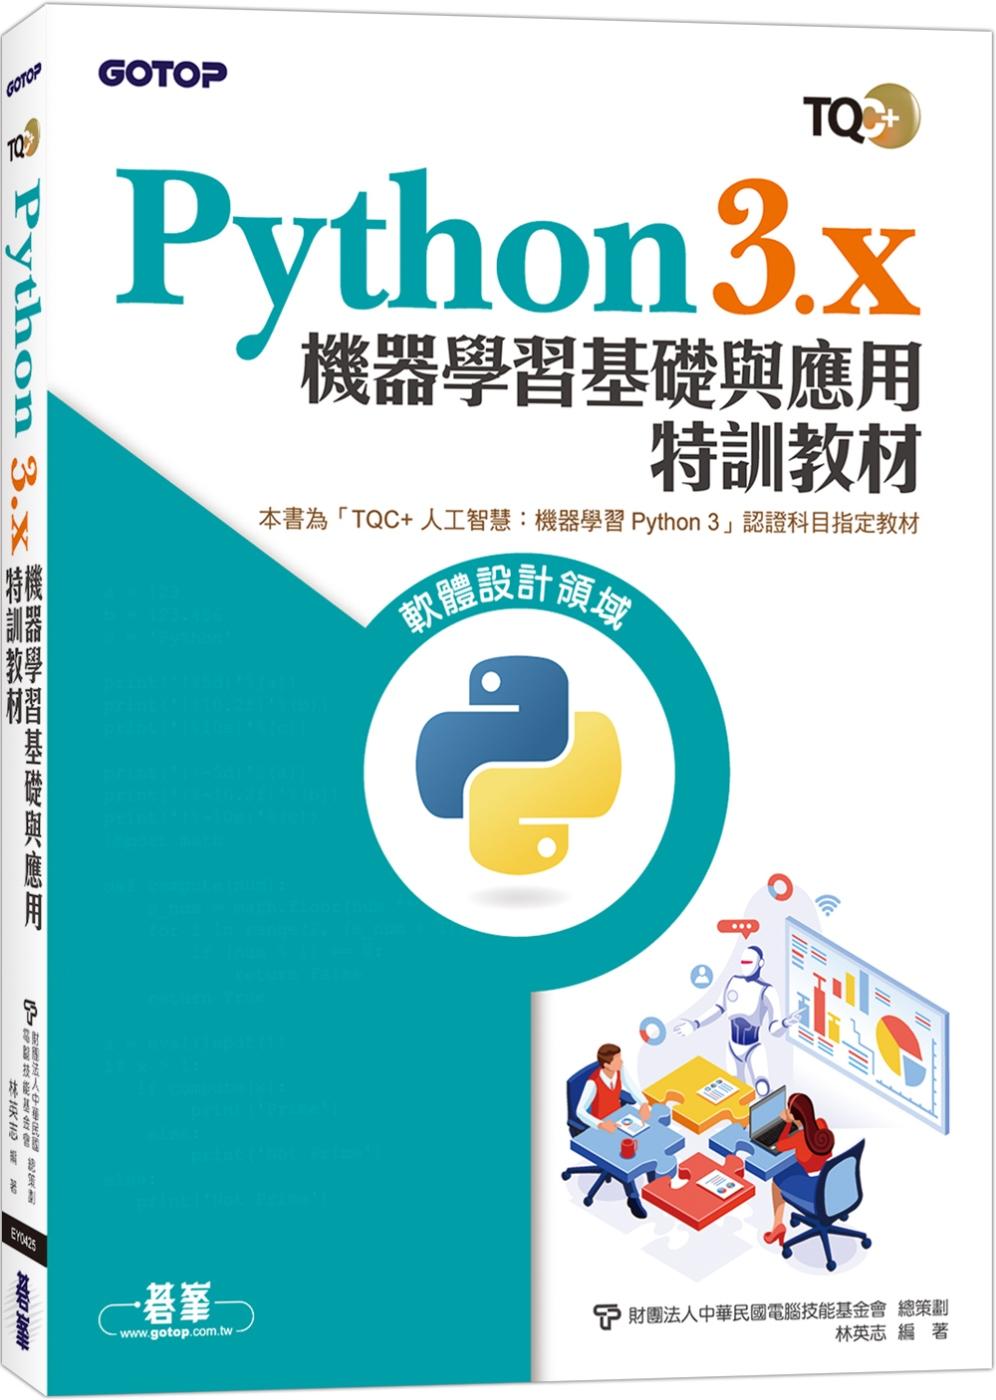 TQC+ Python3.x ...